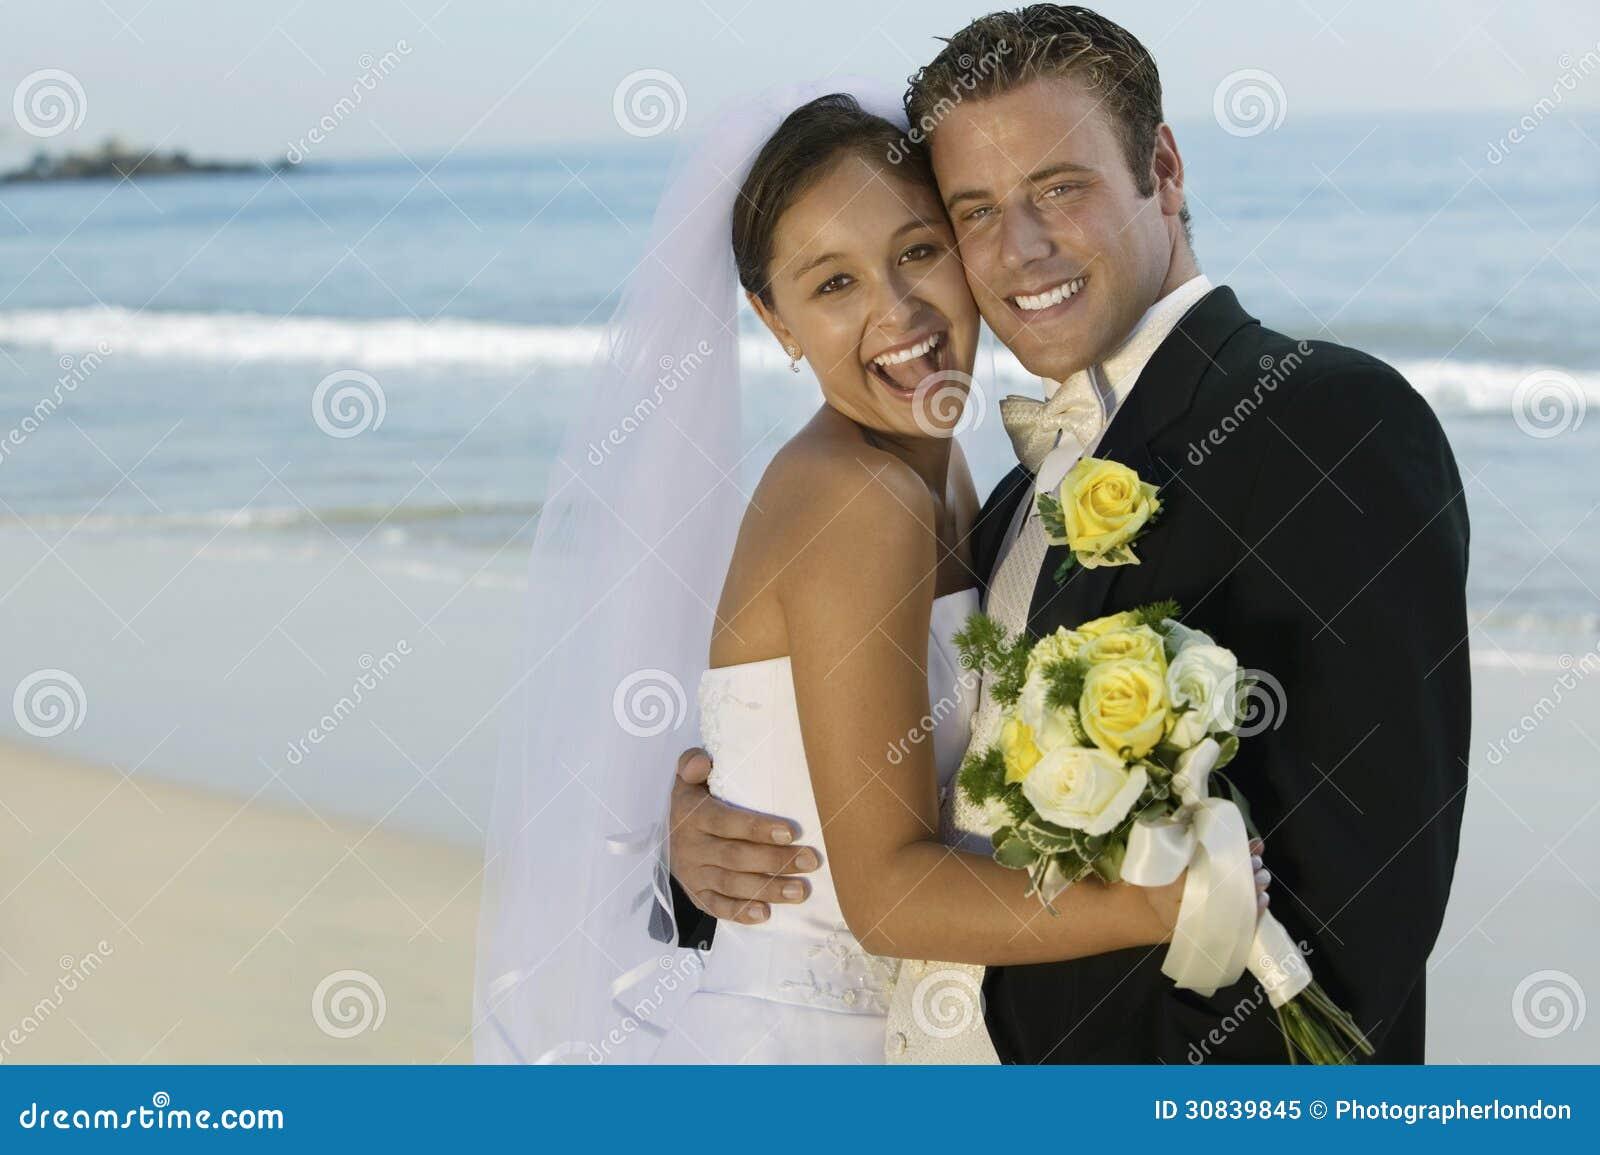 Braut und Bräutigam Embracing On Beach